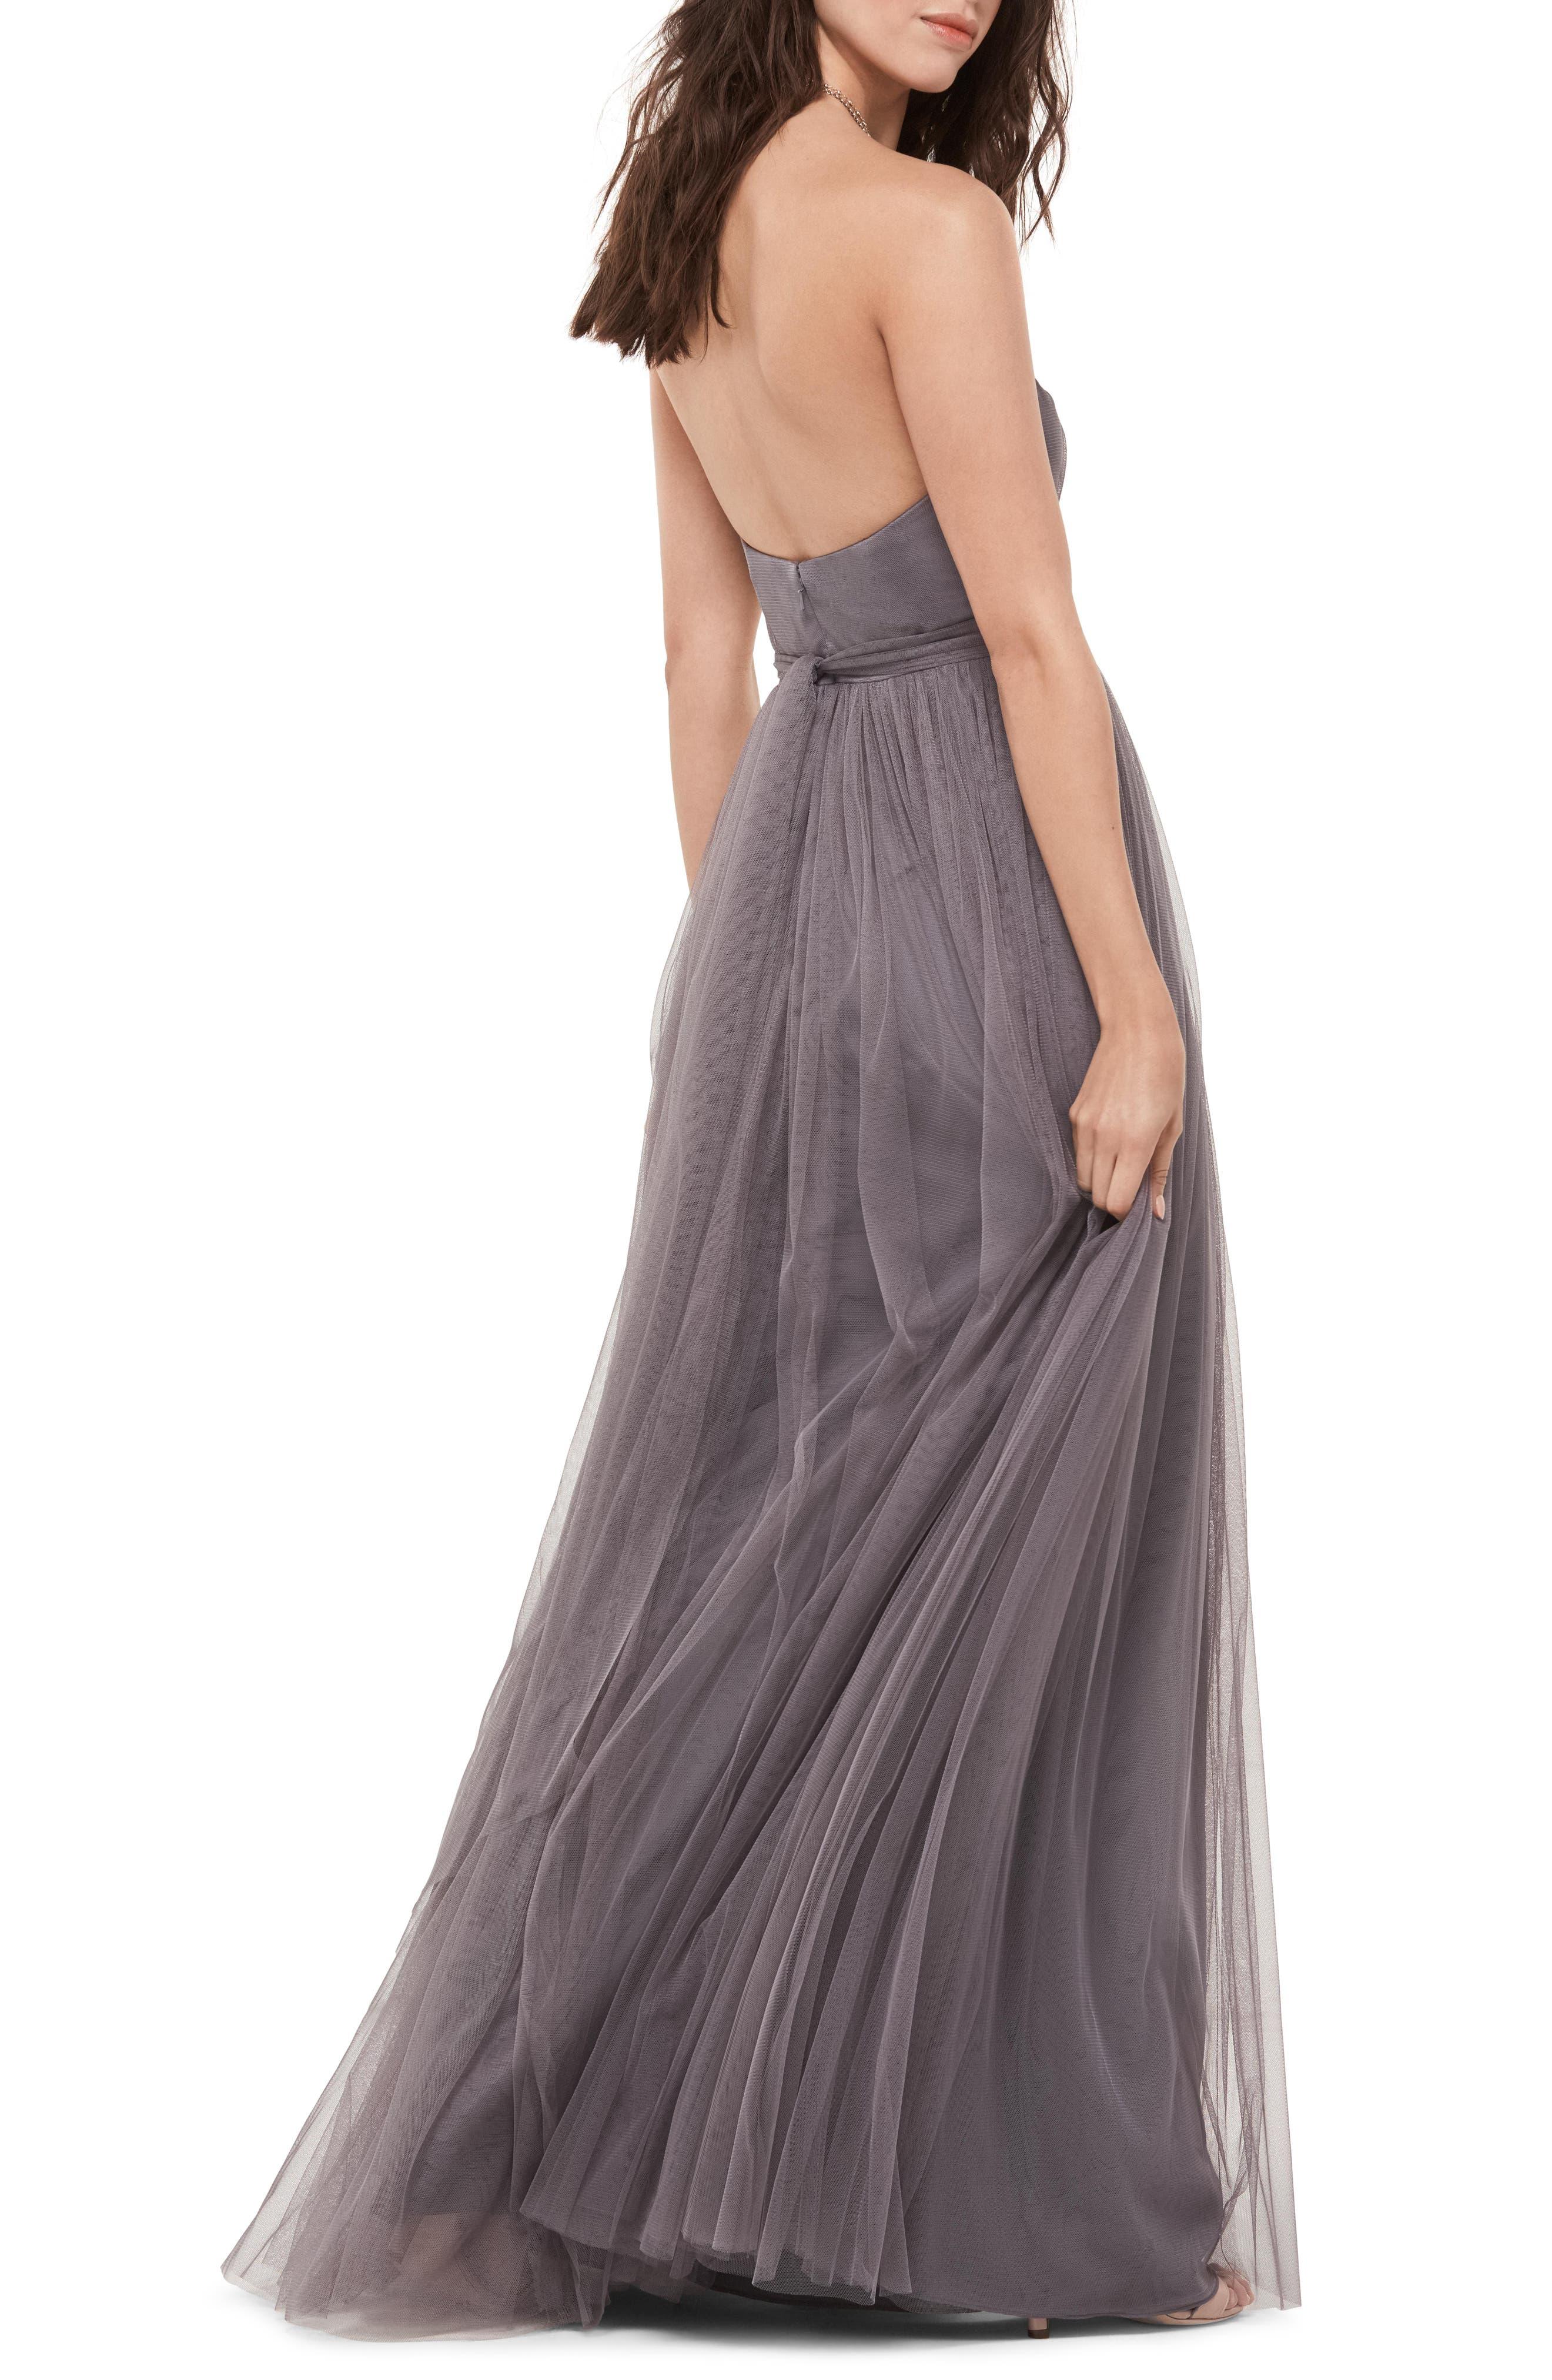 Bobbinet Strapless Gown,                             Alternate thumbnail 2, color,                             030